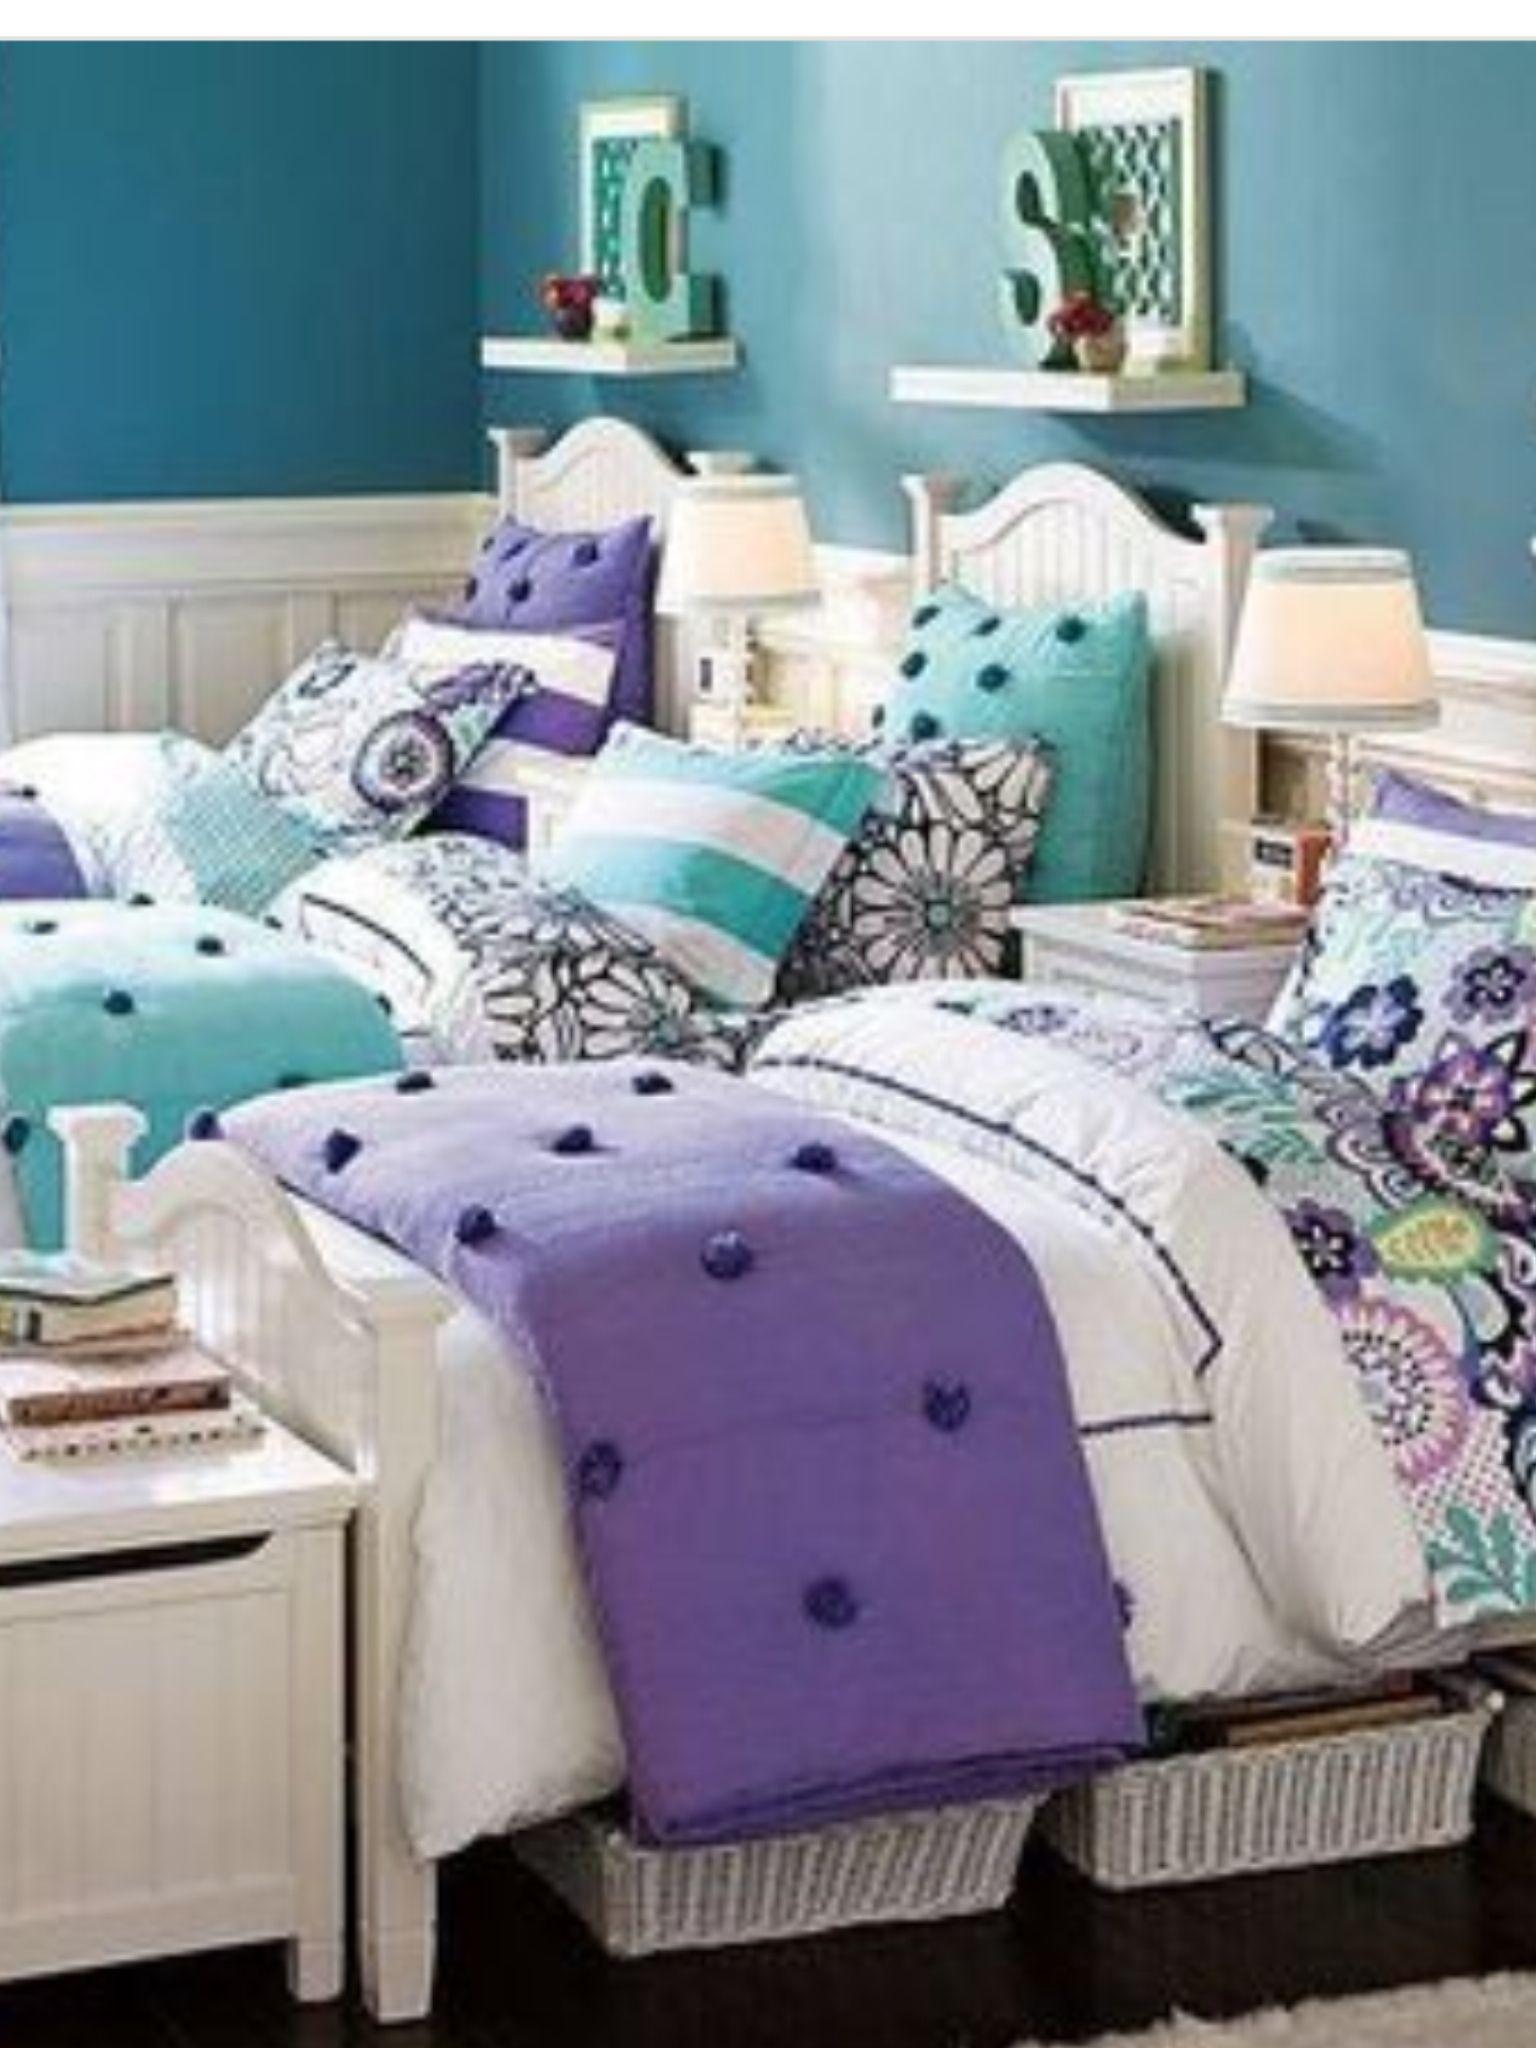 Perfect Triplets Bedroom | Girl bedroom designs, Girls ...